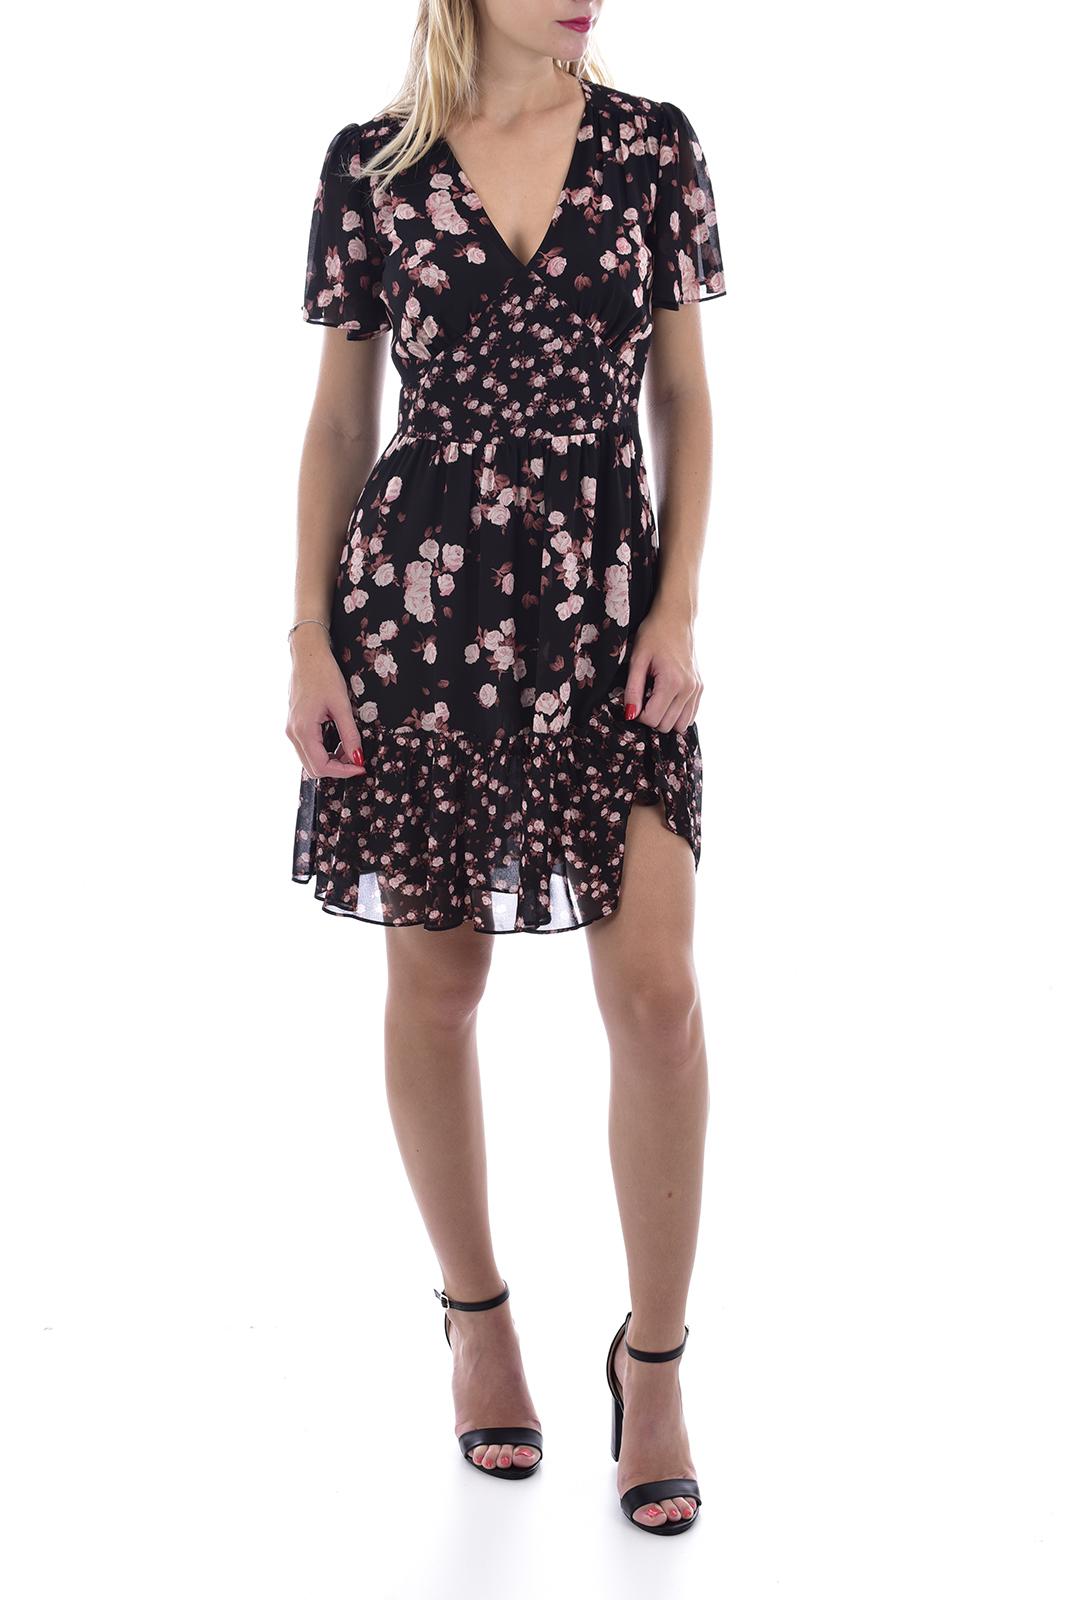 Robes  Michael Kors JH98YE7AFR BLACK/ROSE